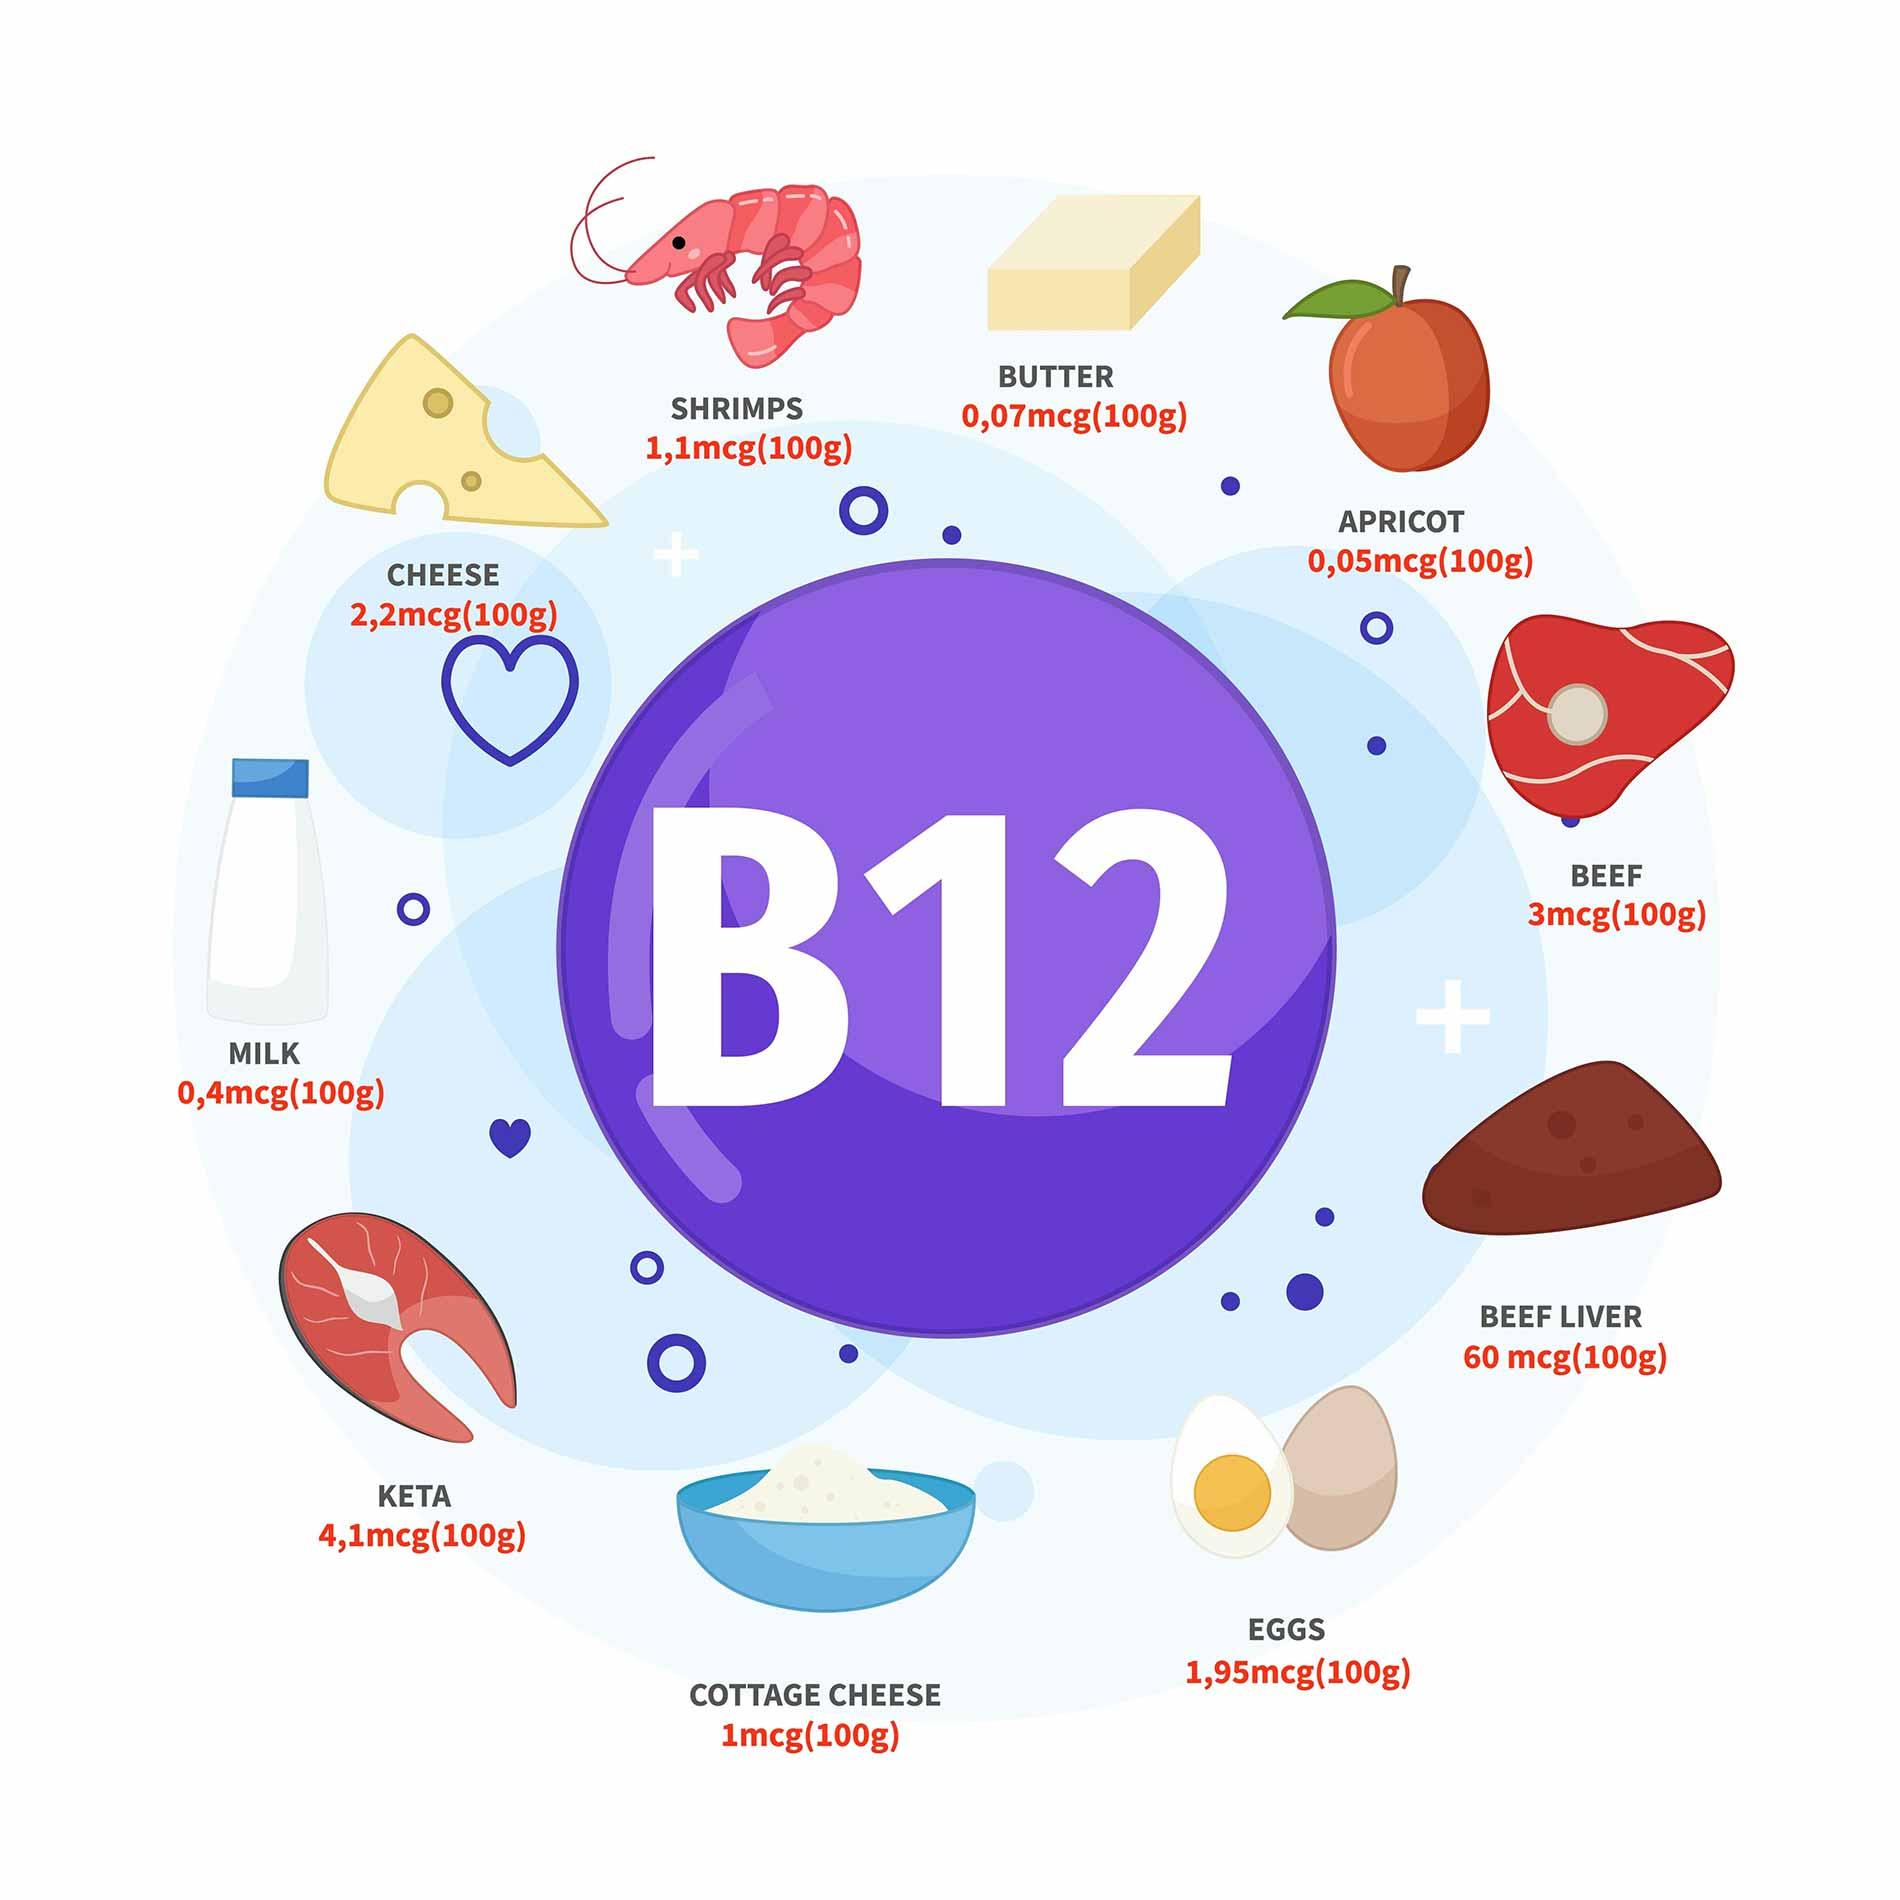 Vitamin-B12-deficiency-is-rare